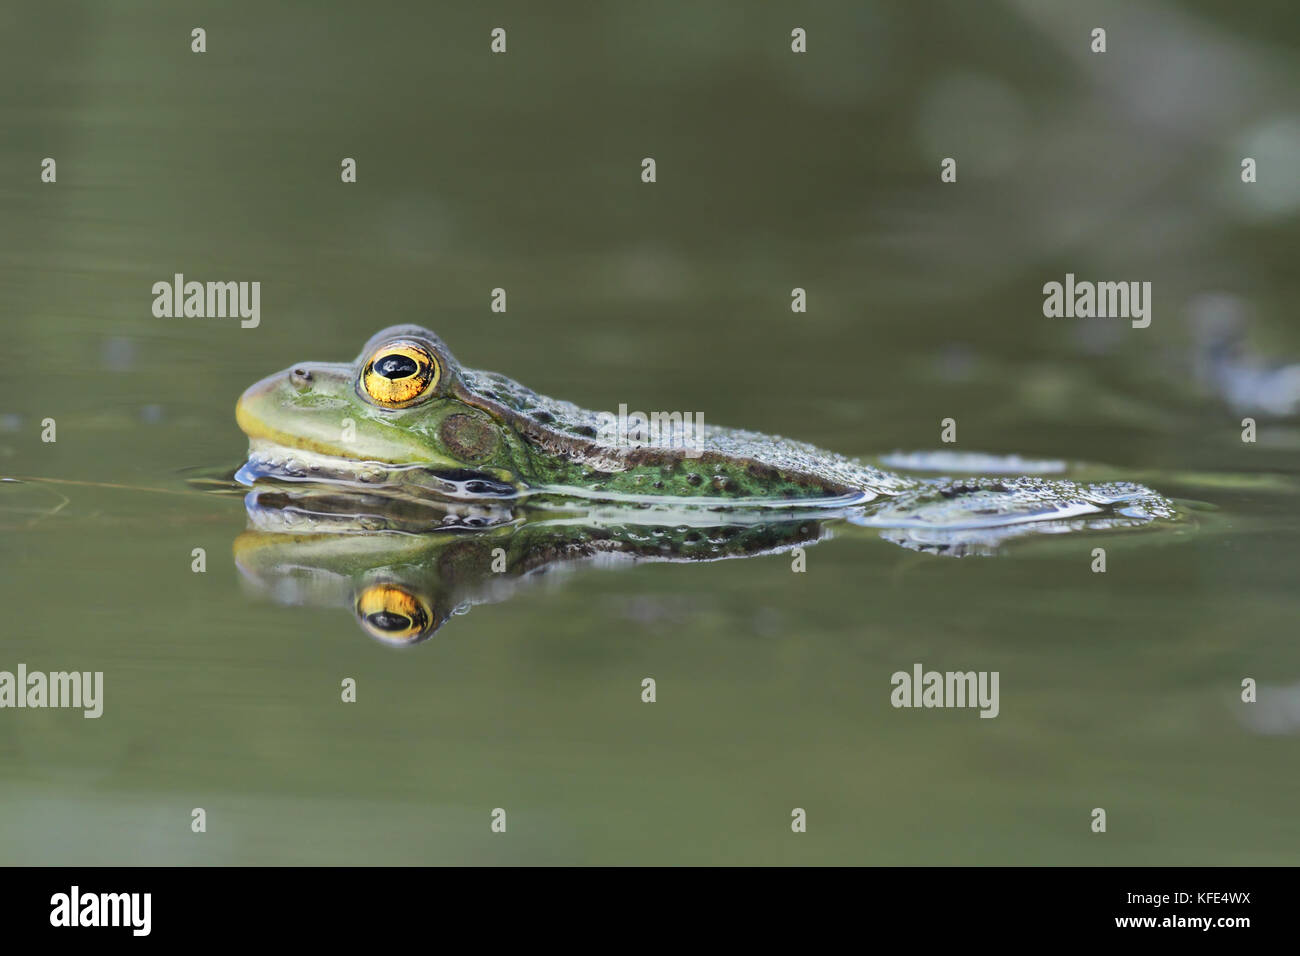 Perez,s frog (Pelophylax perezi) - Stock Image